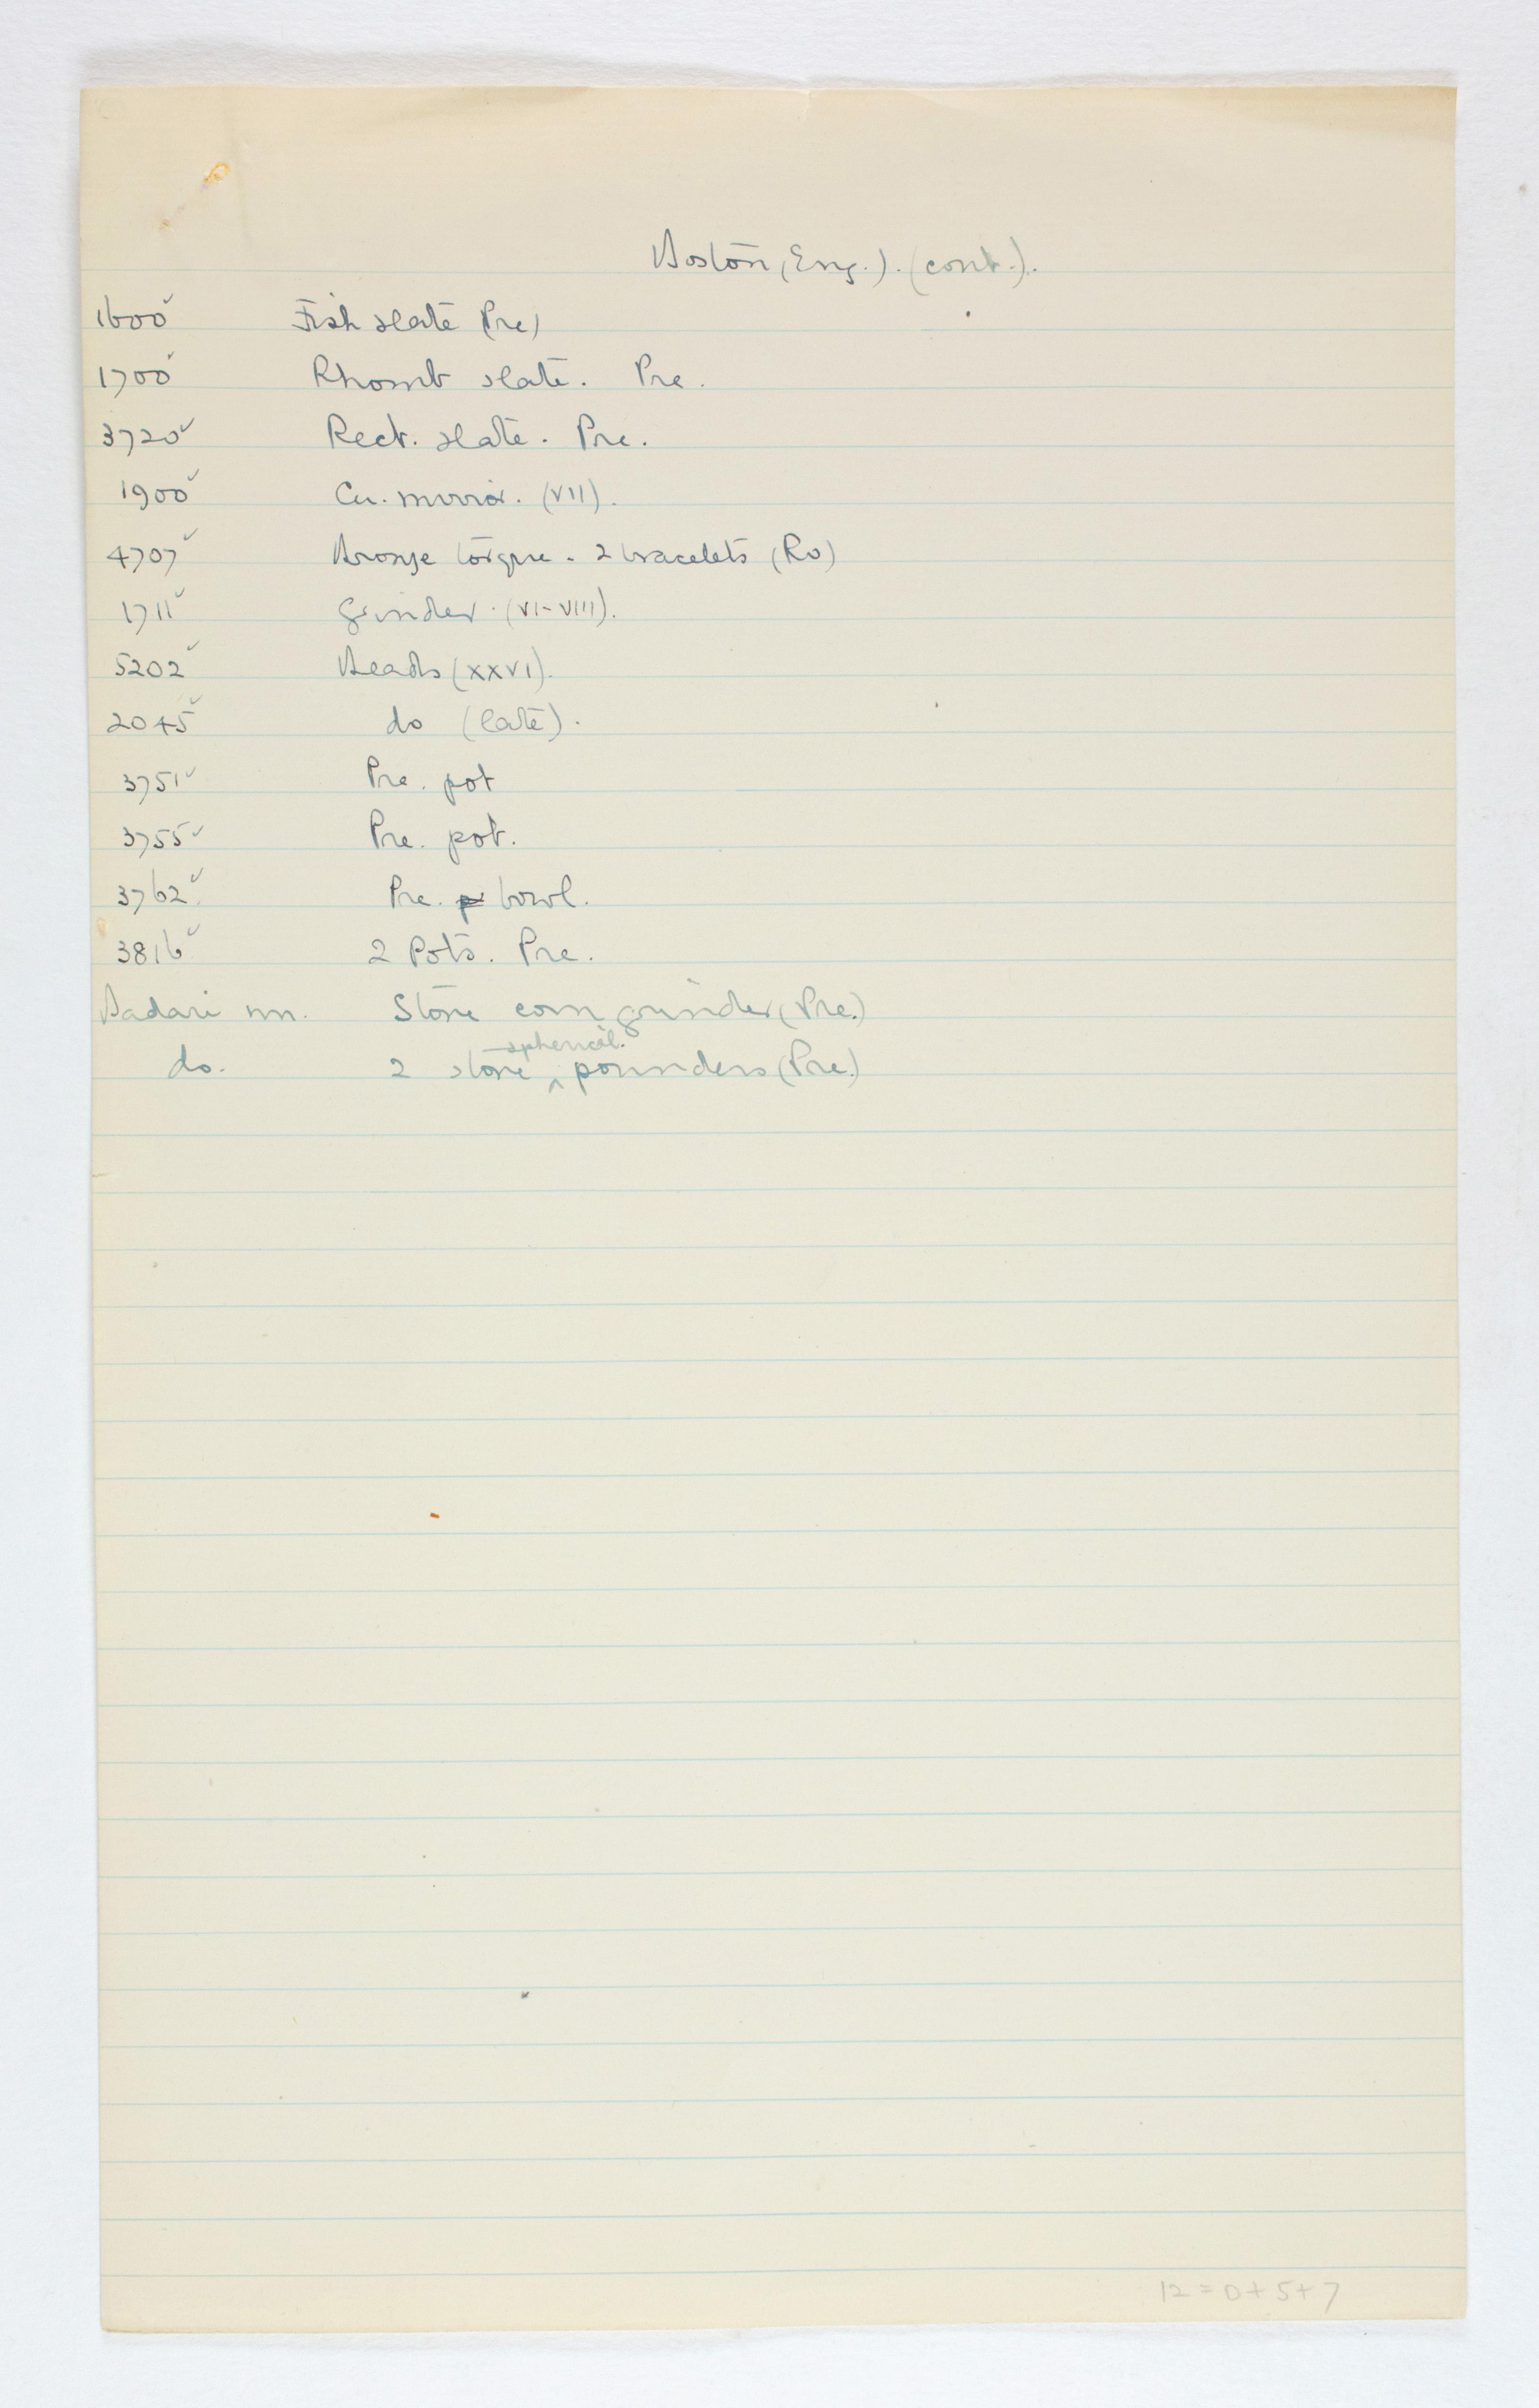 1923-24 Qau el-Kebir, Hemamieh Individual institution list PMA/WFP1/D/27/7.2